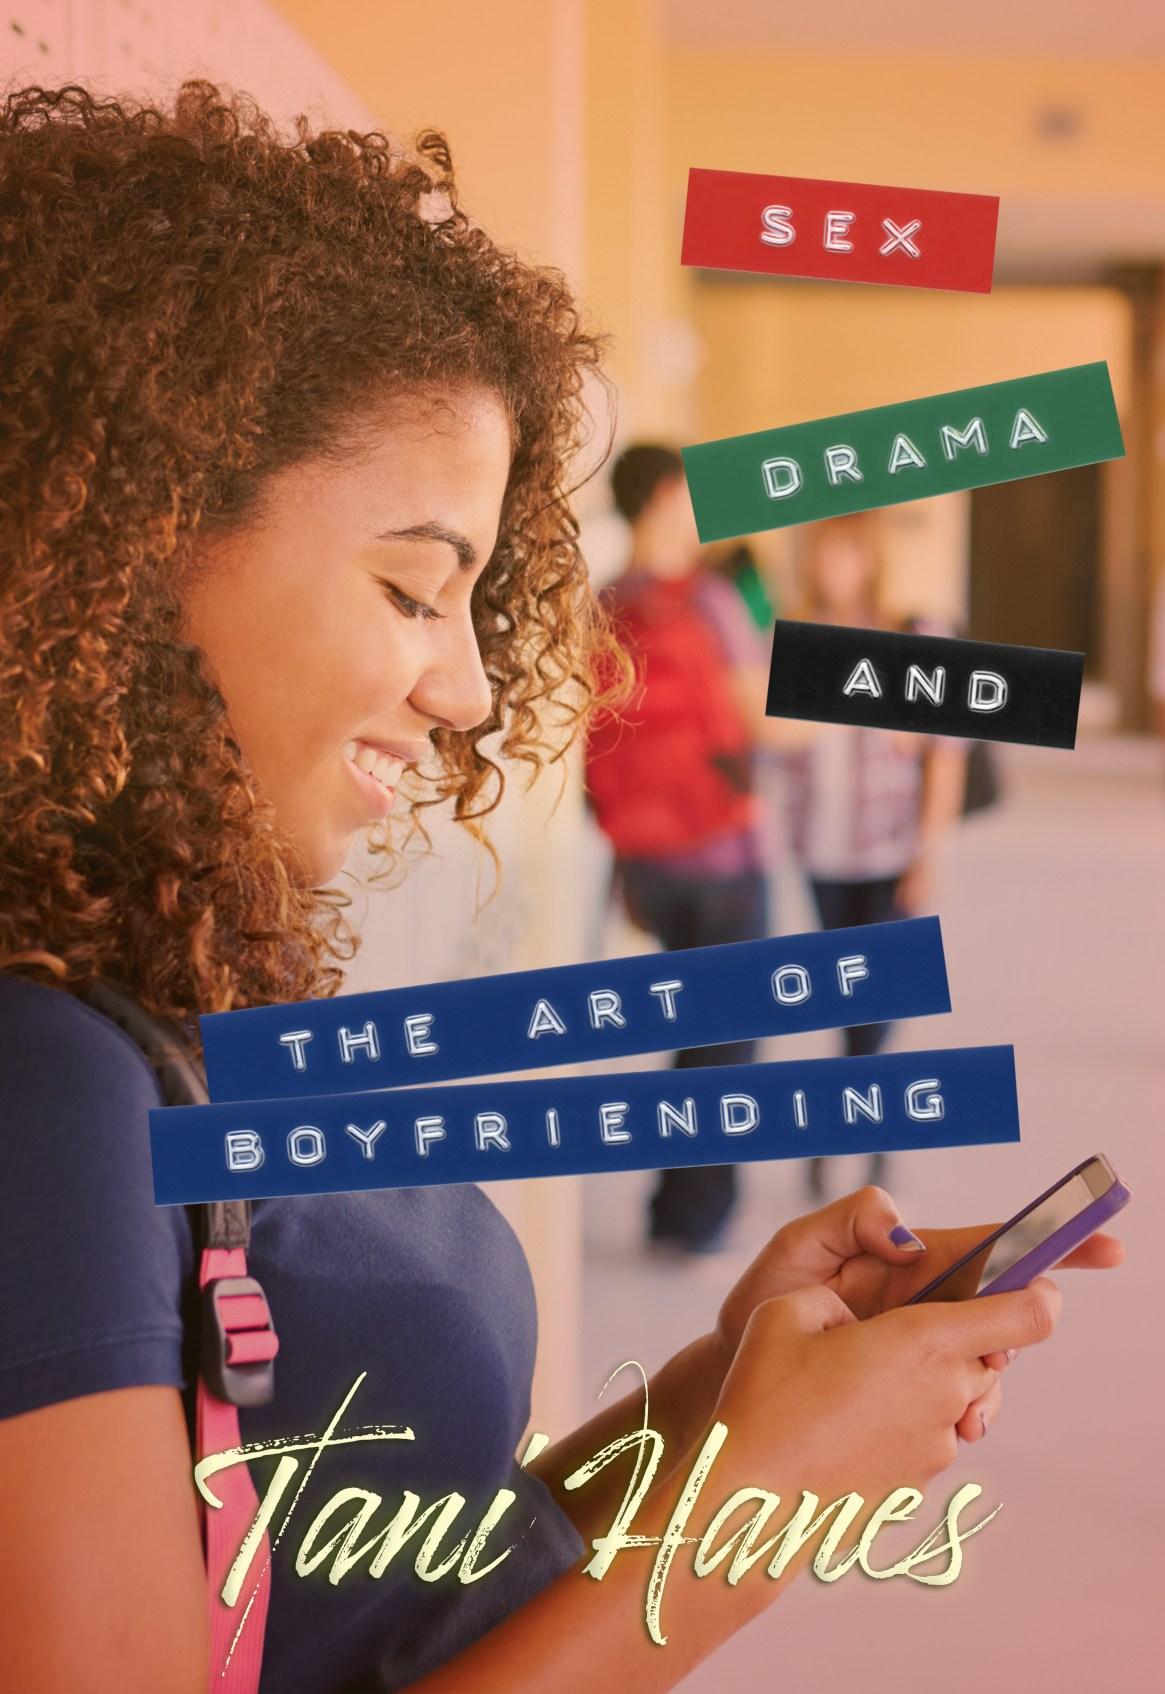 Sex Drama and The Art of Boyfriending